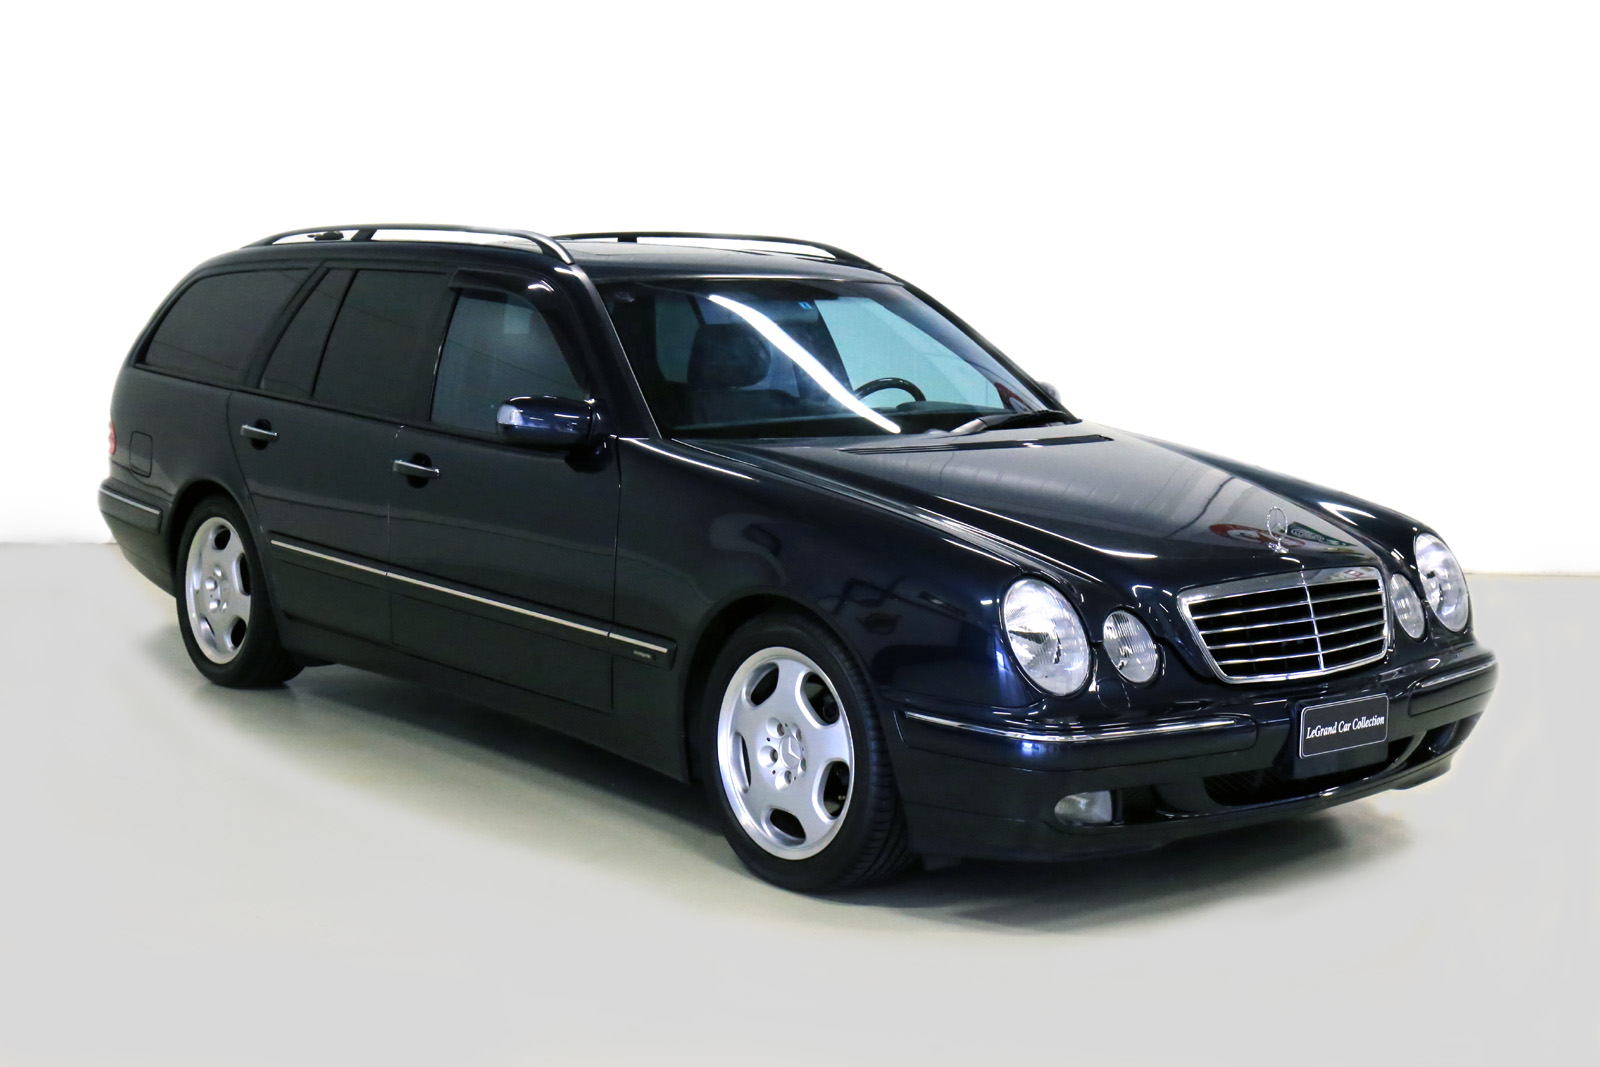 mercedes benz e 430 combi legrand car collection. Black Bedroom Furniture Sets. Home Design Ideas